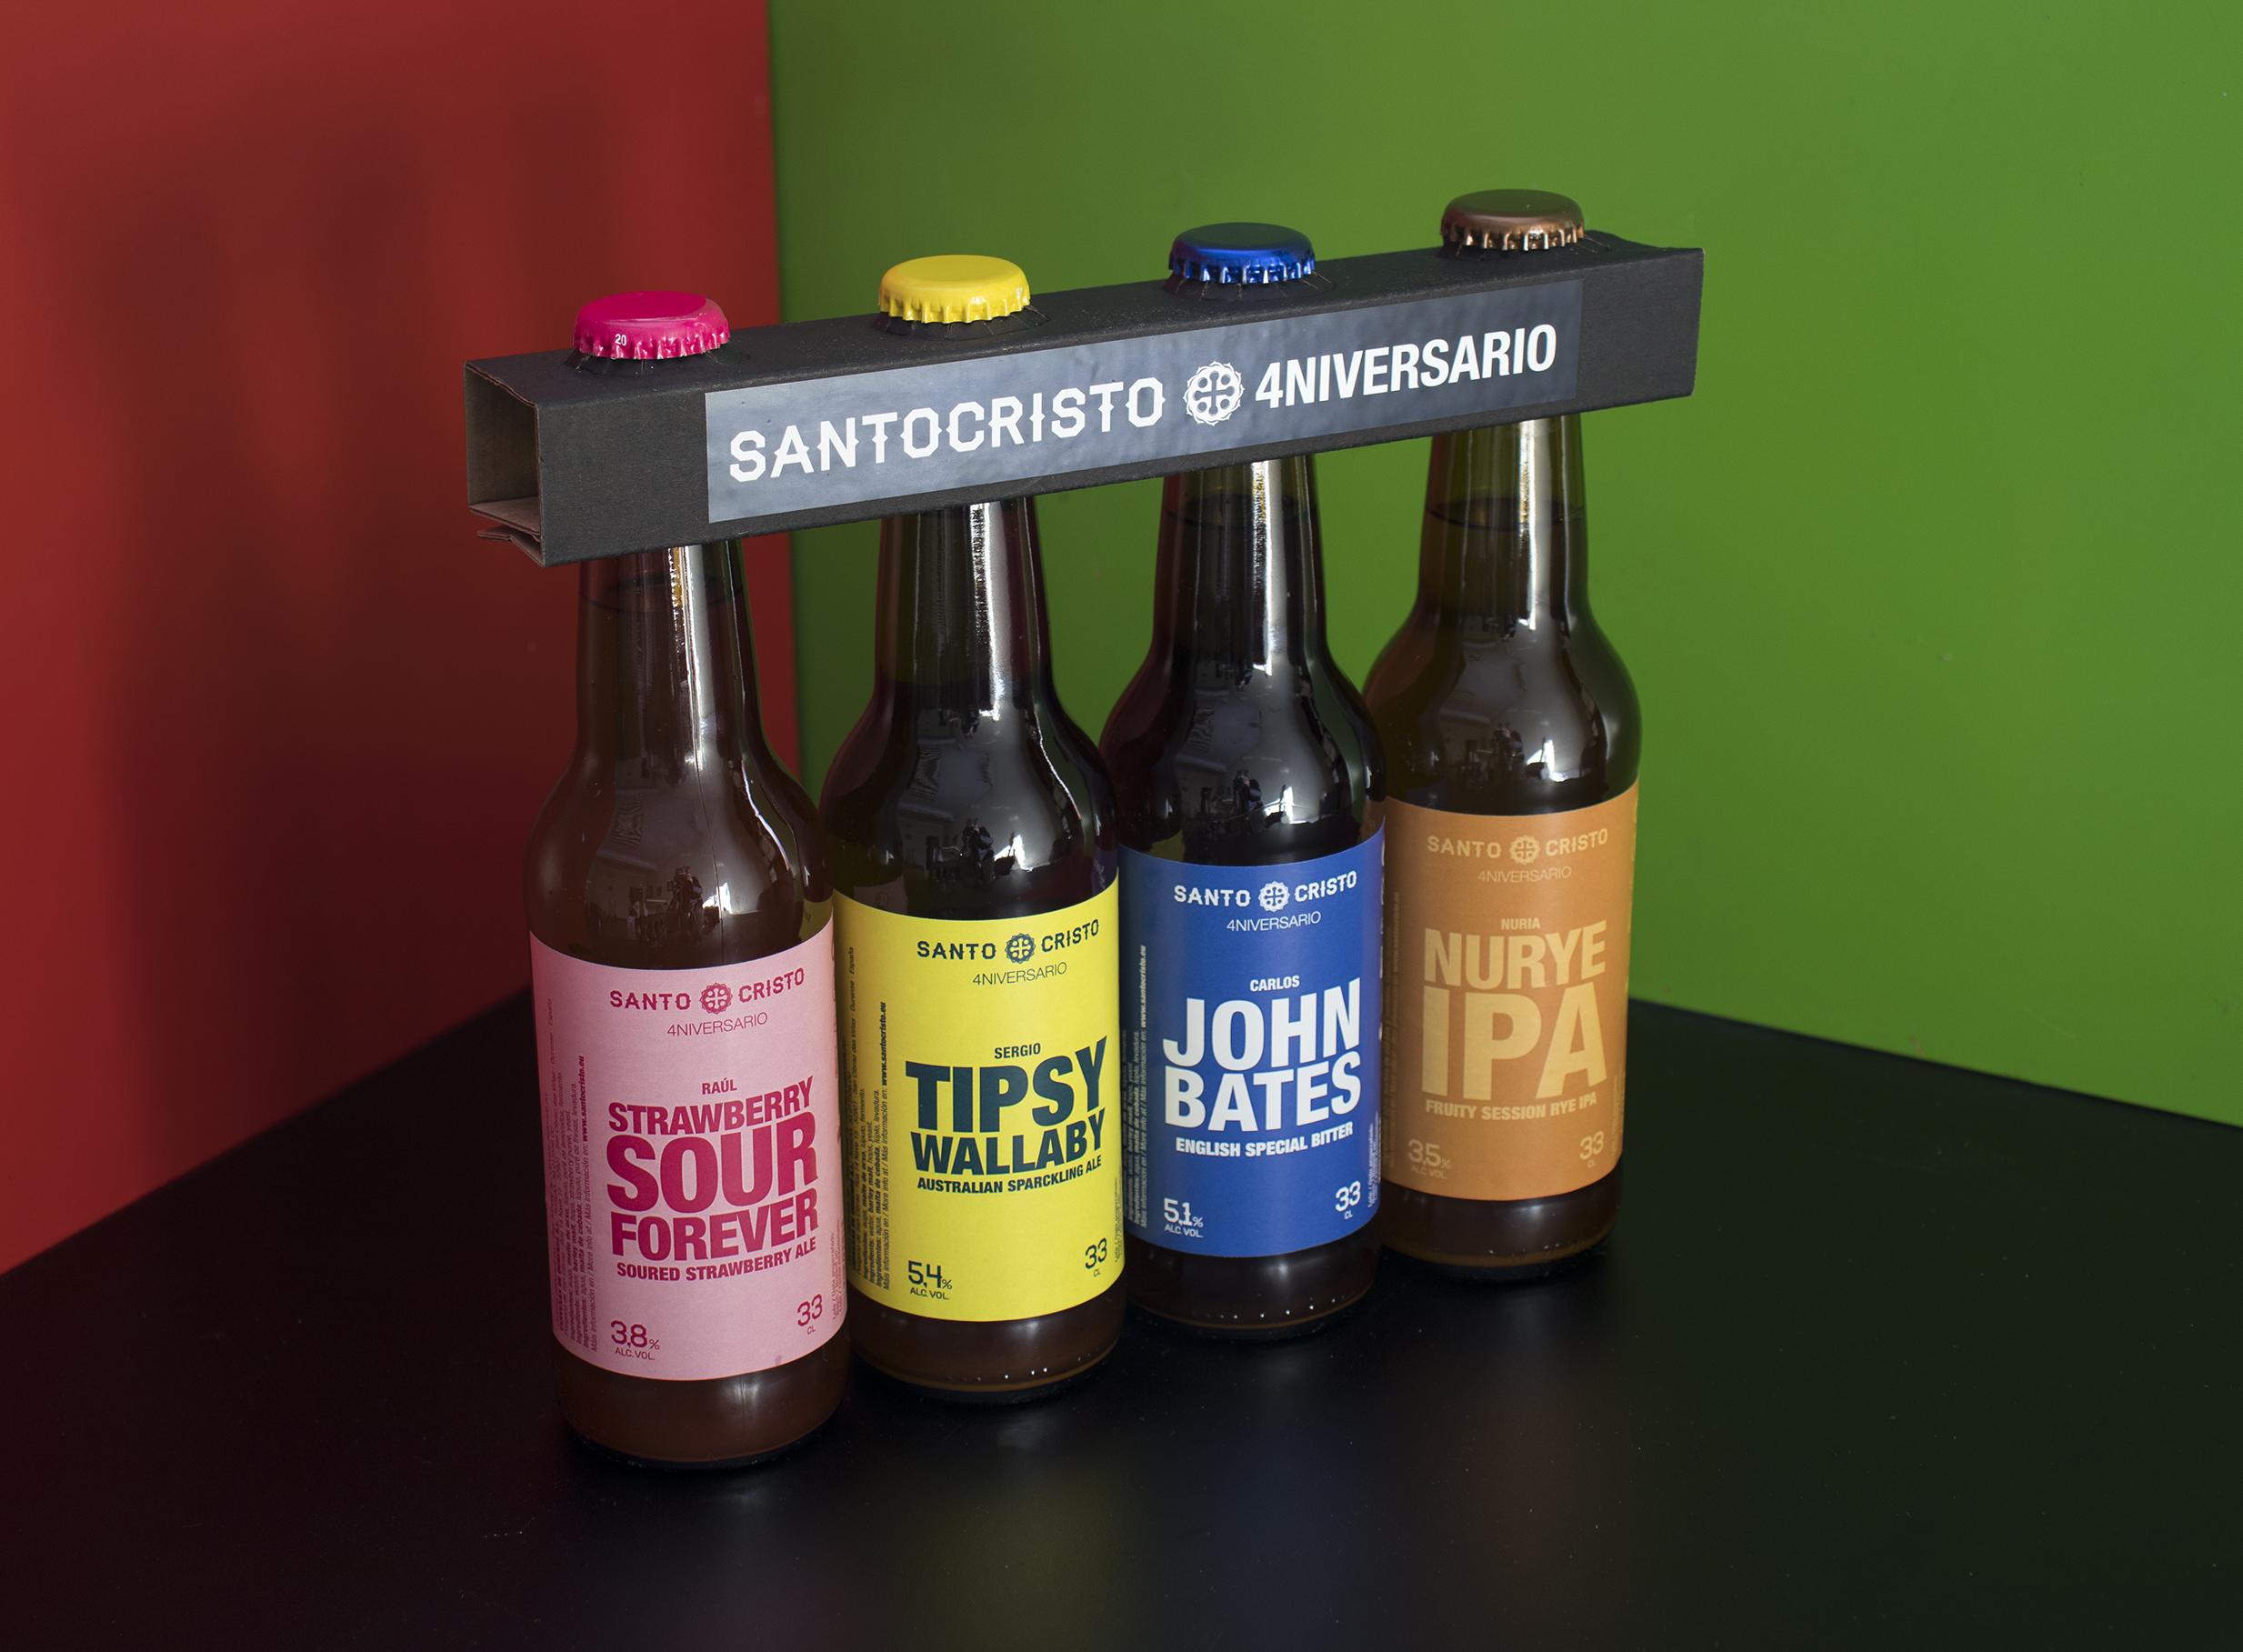 4aniversario cervexa santo cristo